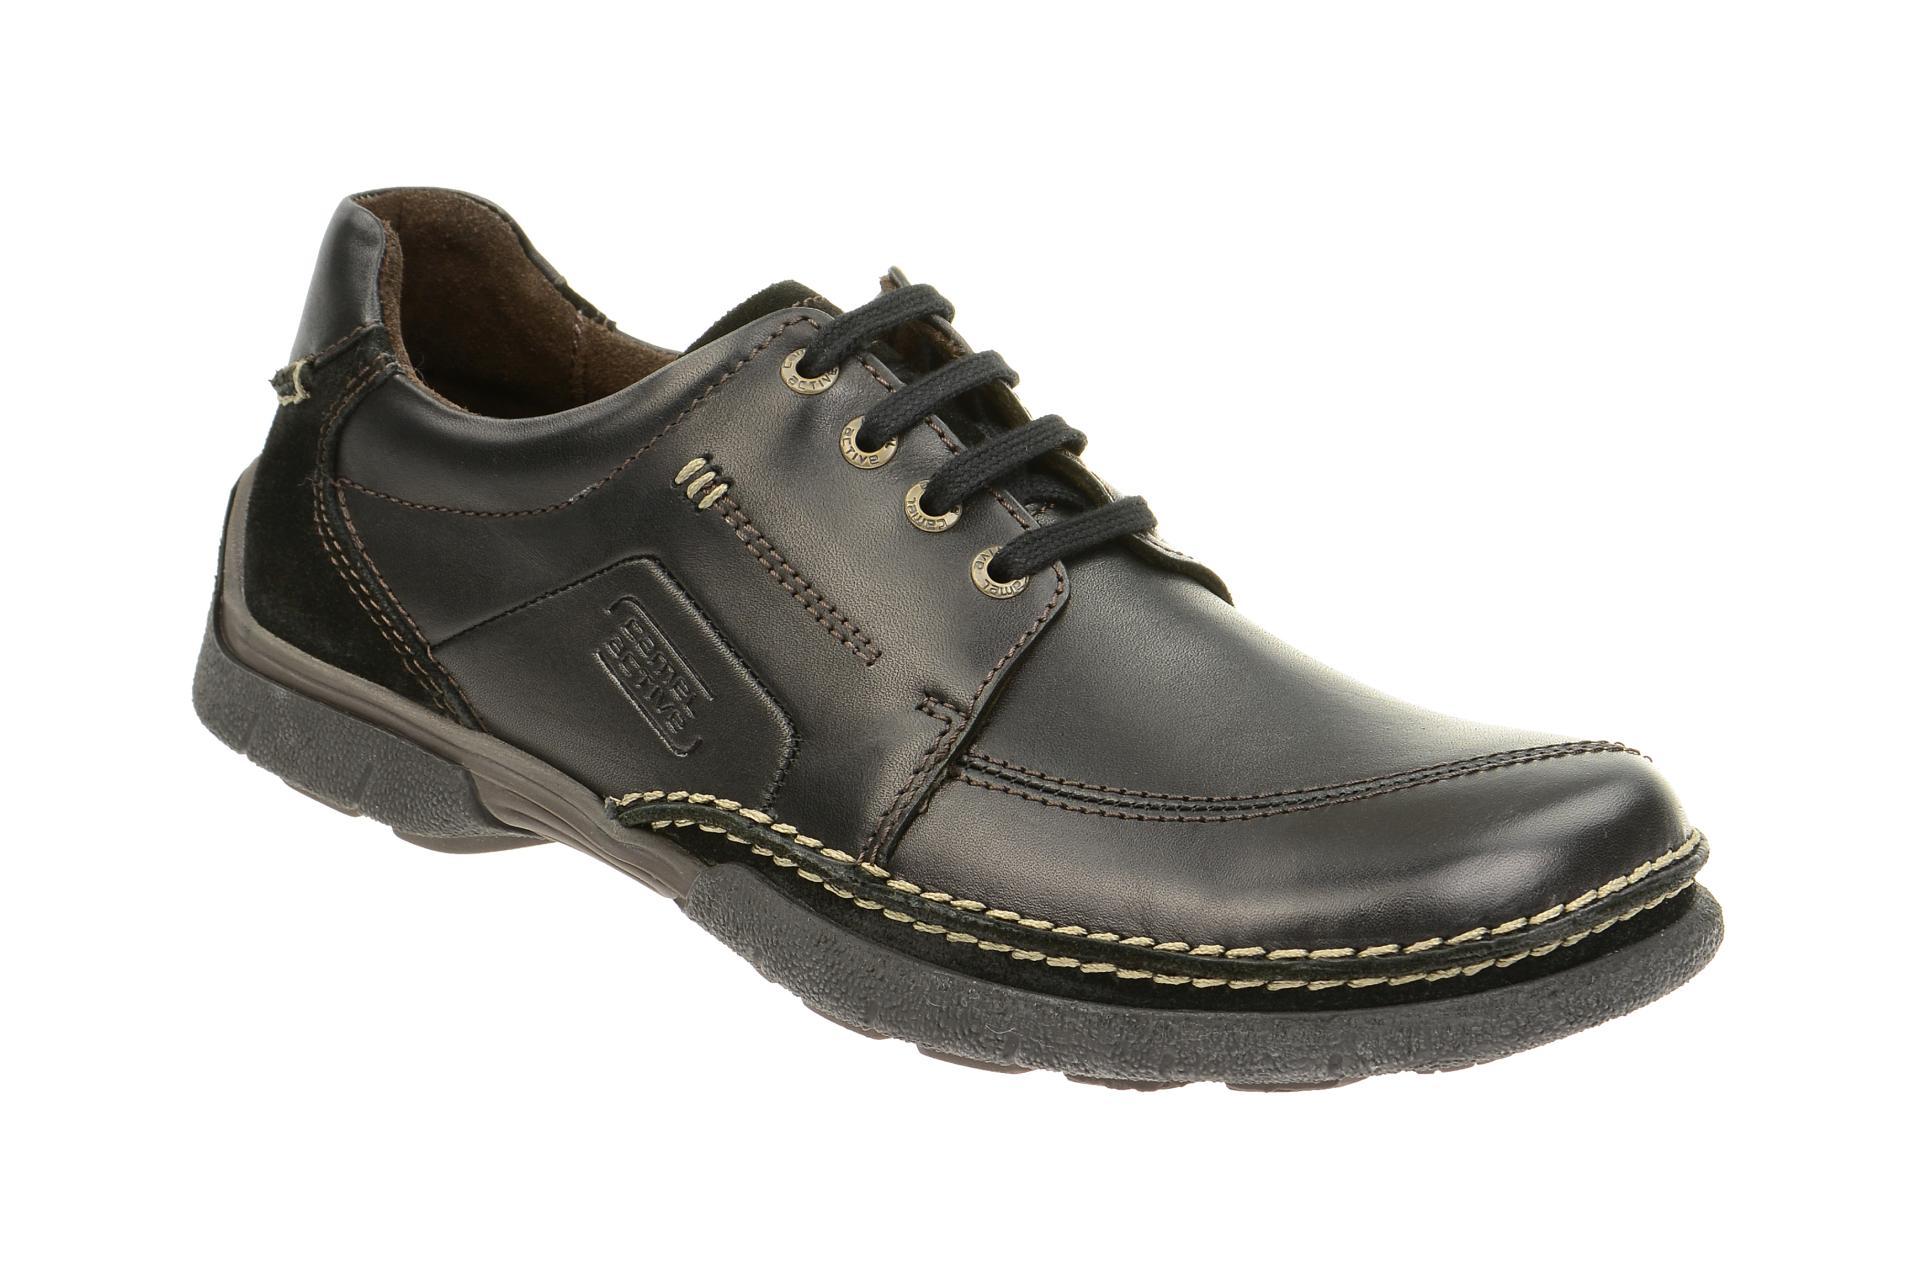 new styles 8aeed 96ca1 Details zu camel active Schuhe MARS schwarz Herrenschuhe 133.15.08 NEU